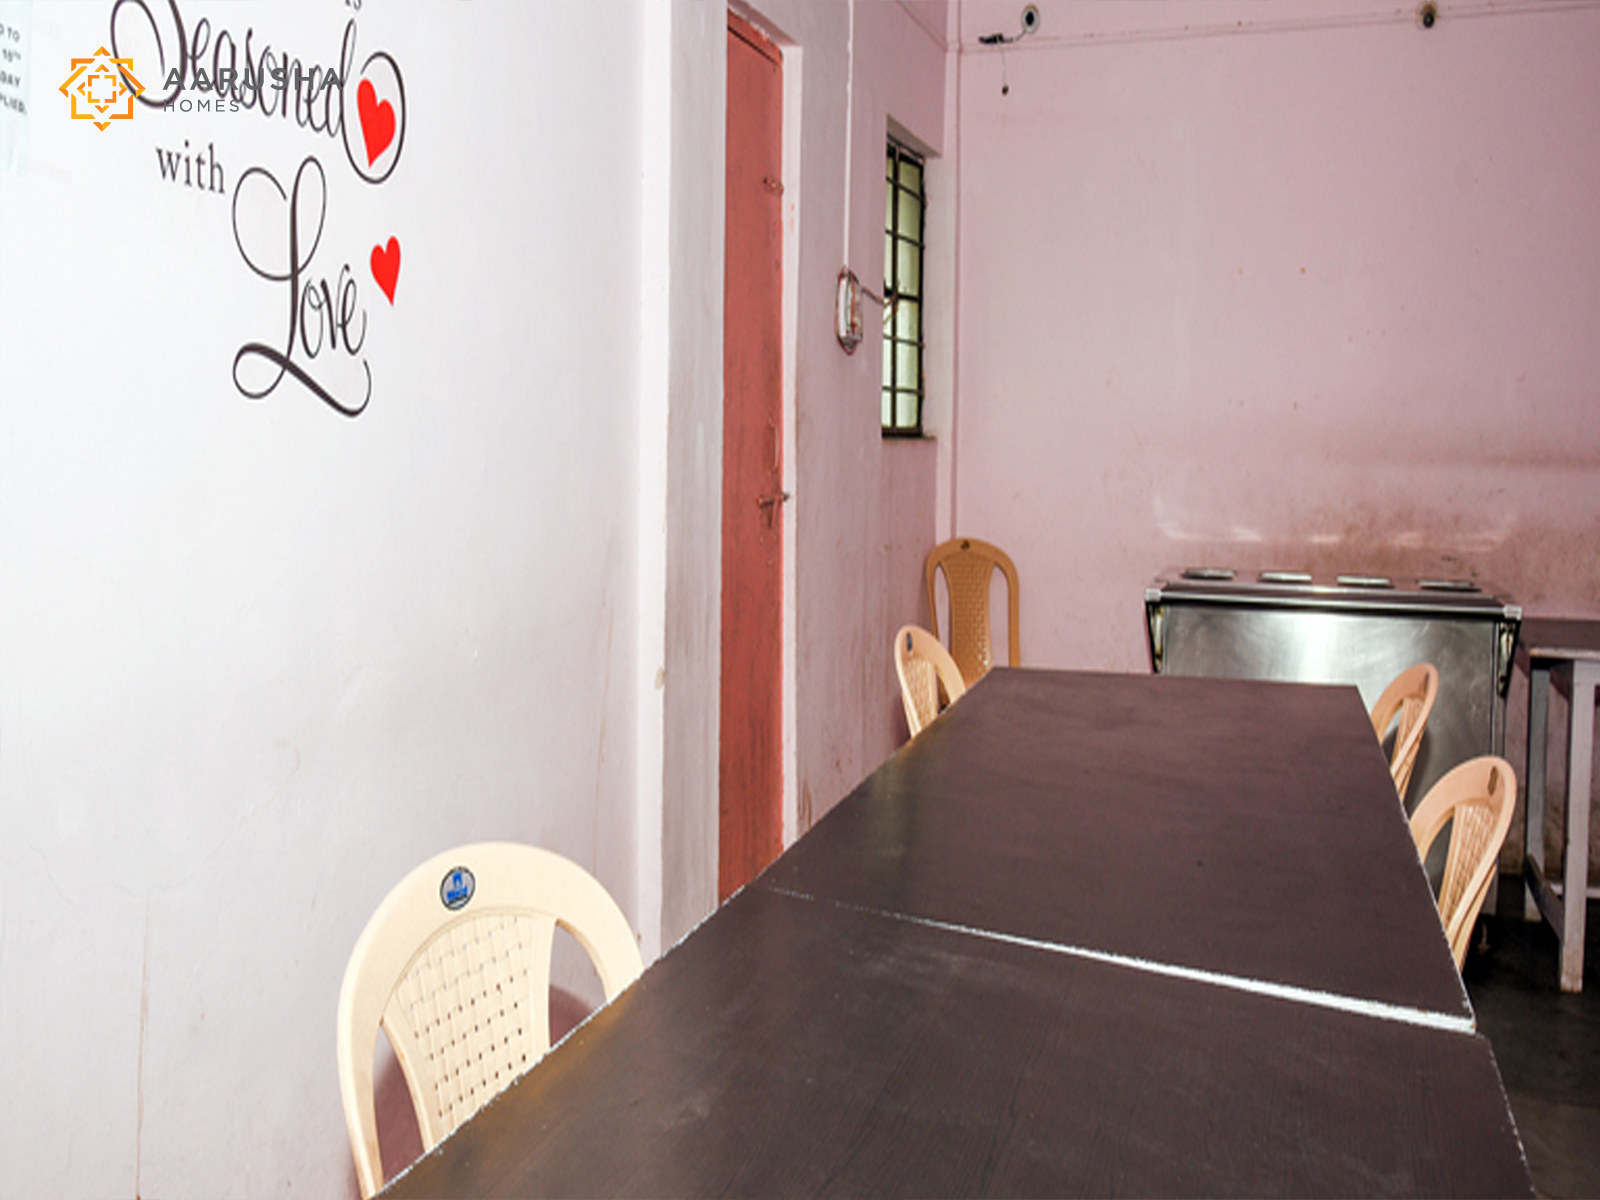 PG & Hostel For Women In Hinjewadi Chowk, Pune